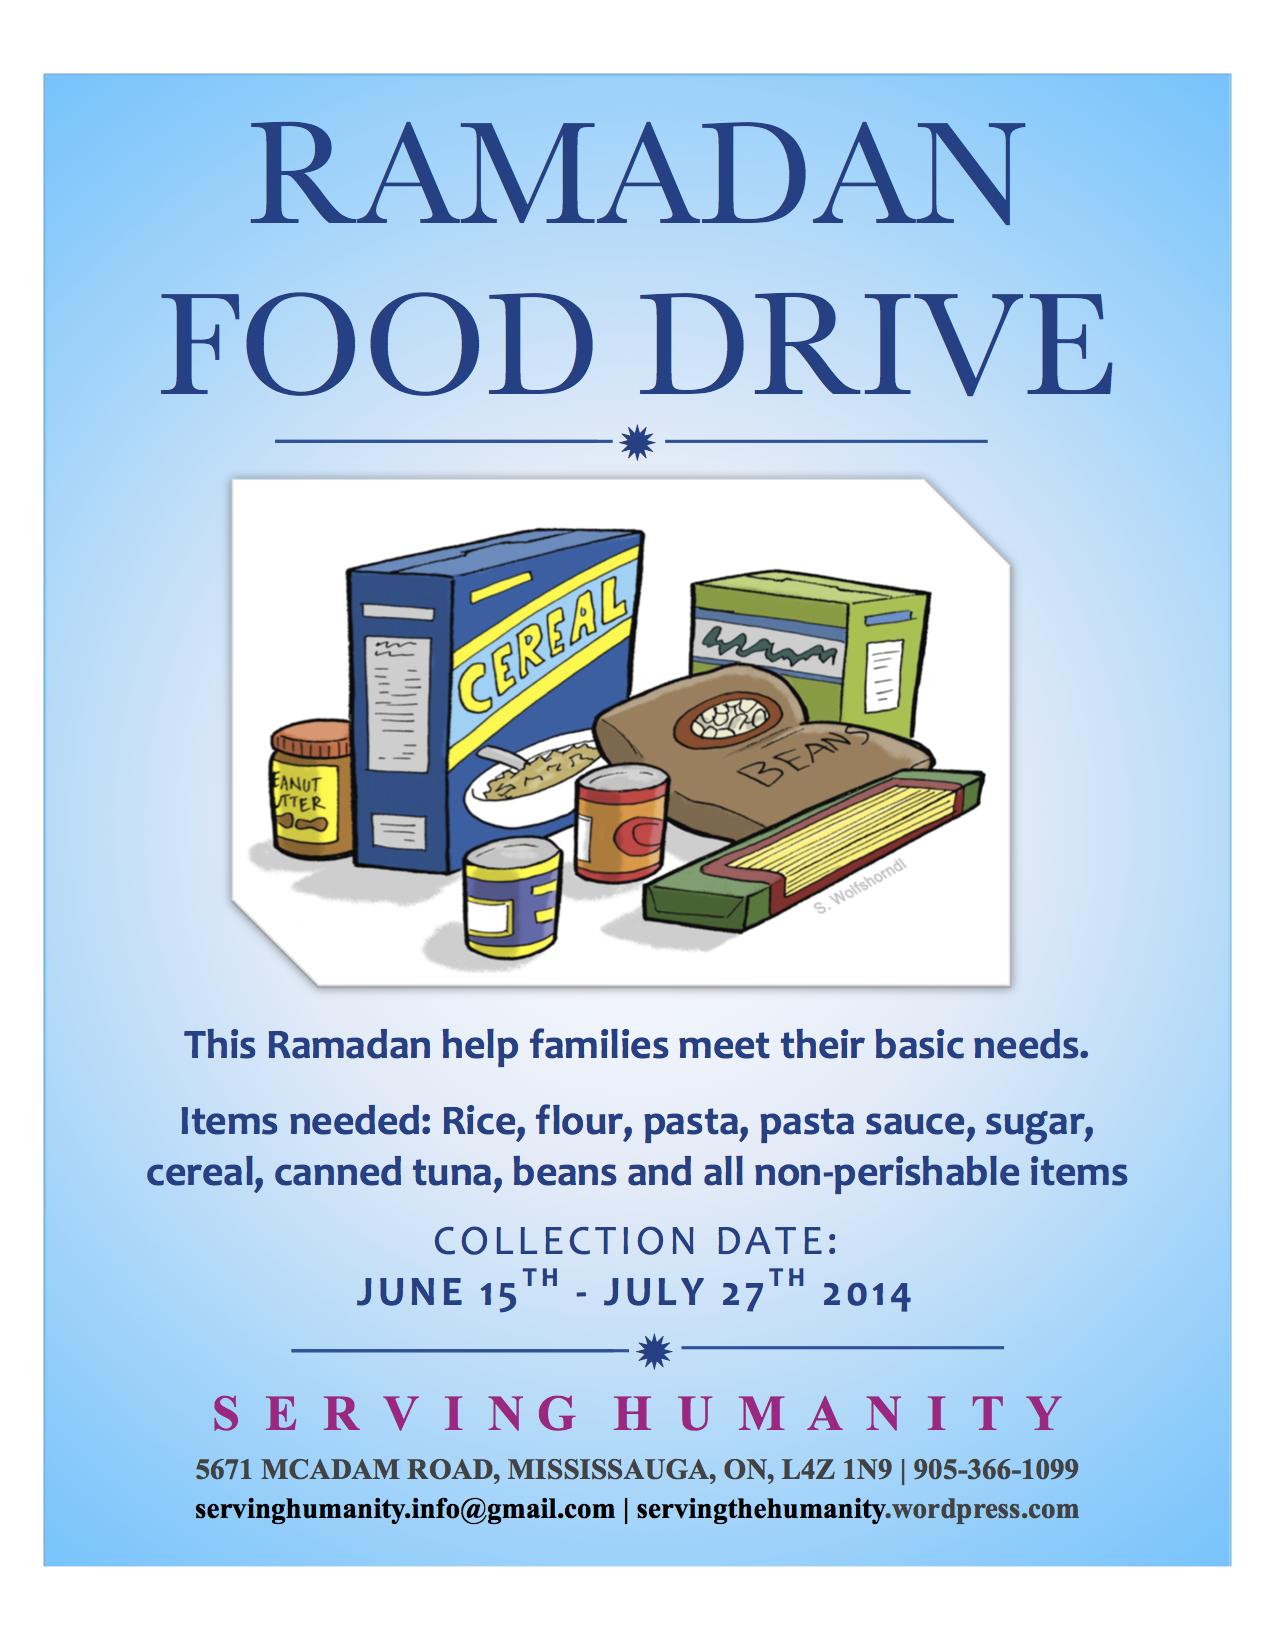 Ramadan Food Drive Flyer 2014